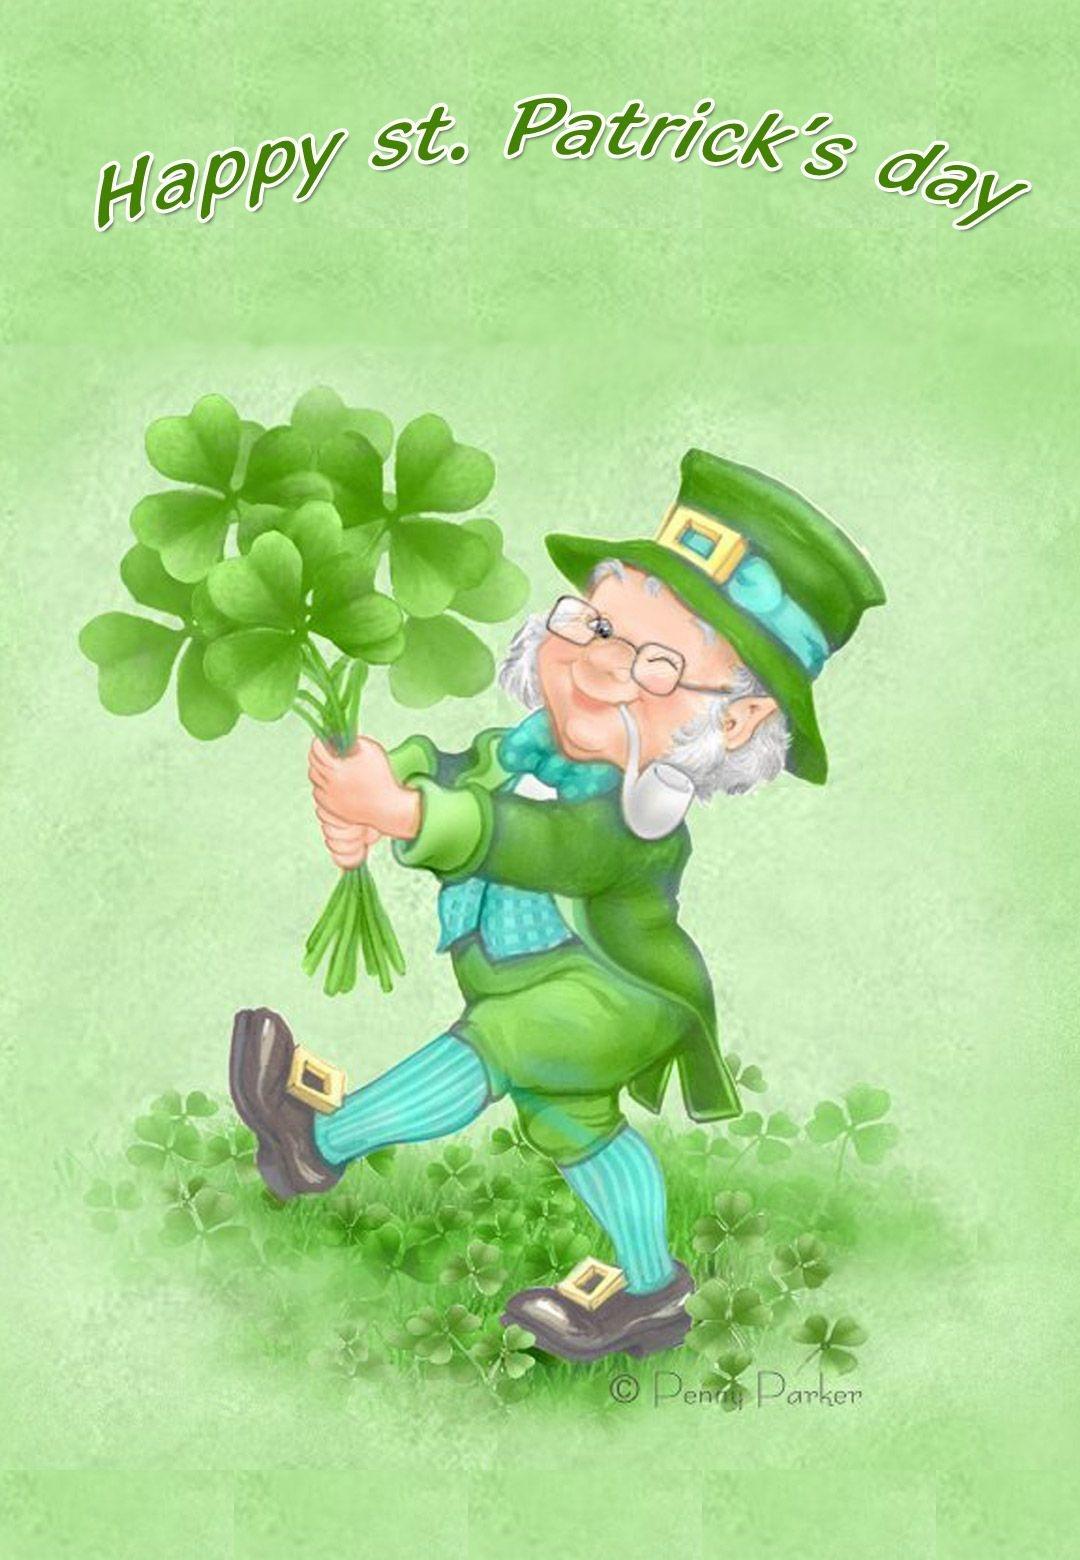 Free Printable Happy St Patricks Day Greeting Card | Printable St - Free Printable St Patrick's Day Card